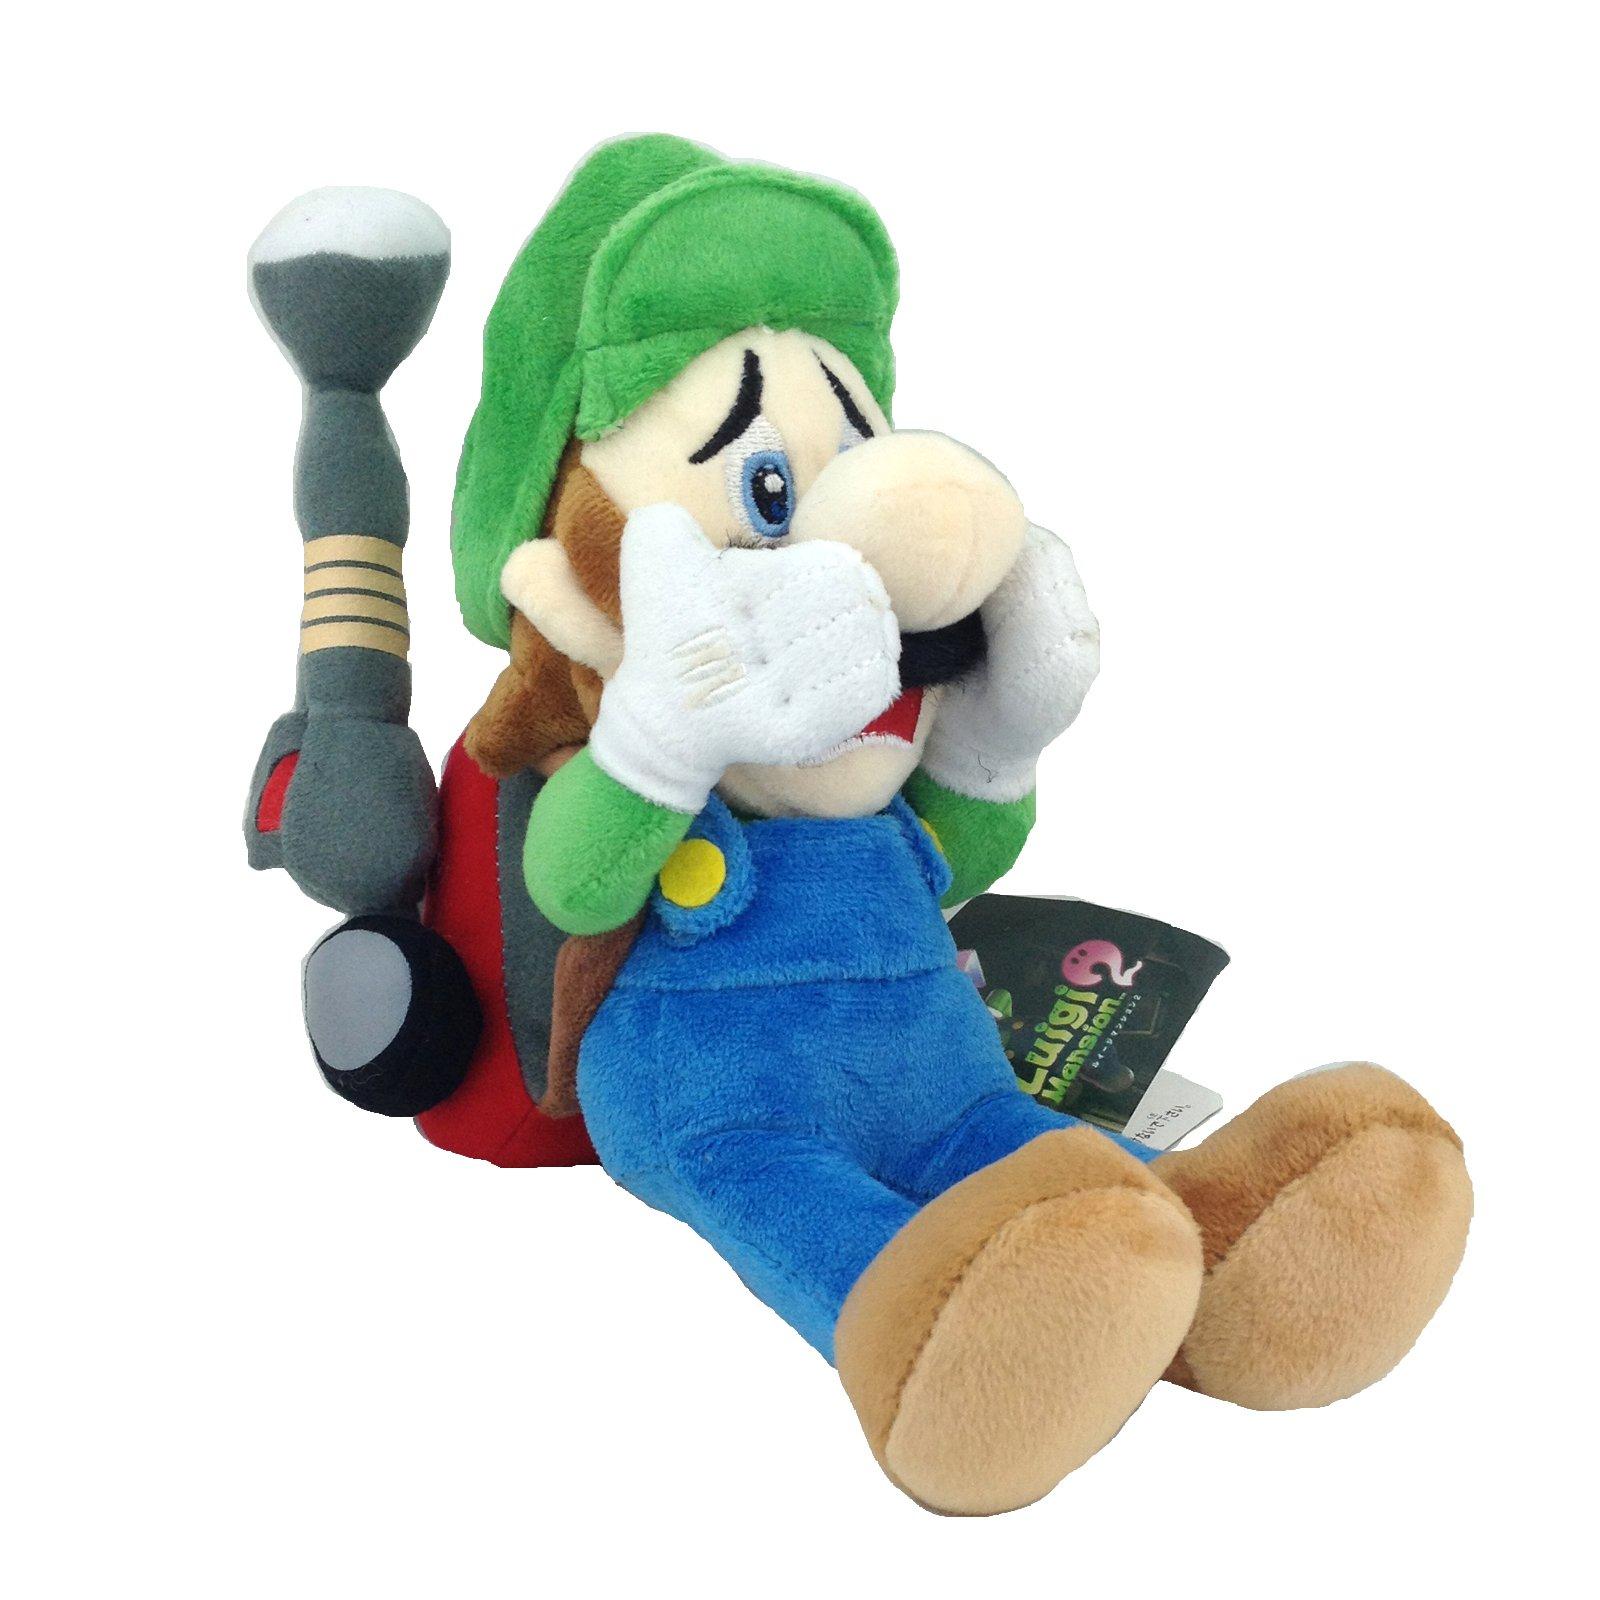 Generic Luigi's Mansion 2 Luigi Super Mario Bros Character Plush Toy Stuffed Animal with Vacuum Soft Figure Doll 9'' by Generic